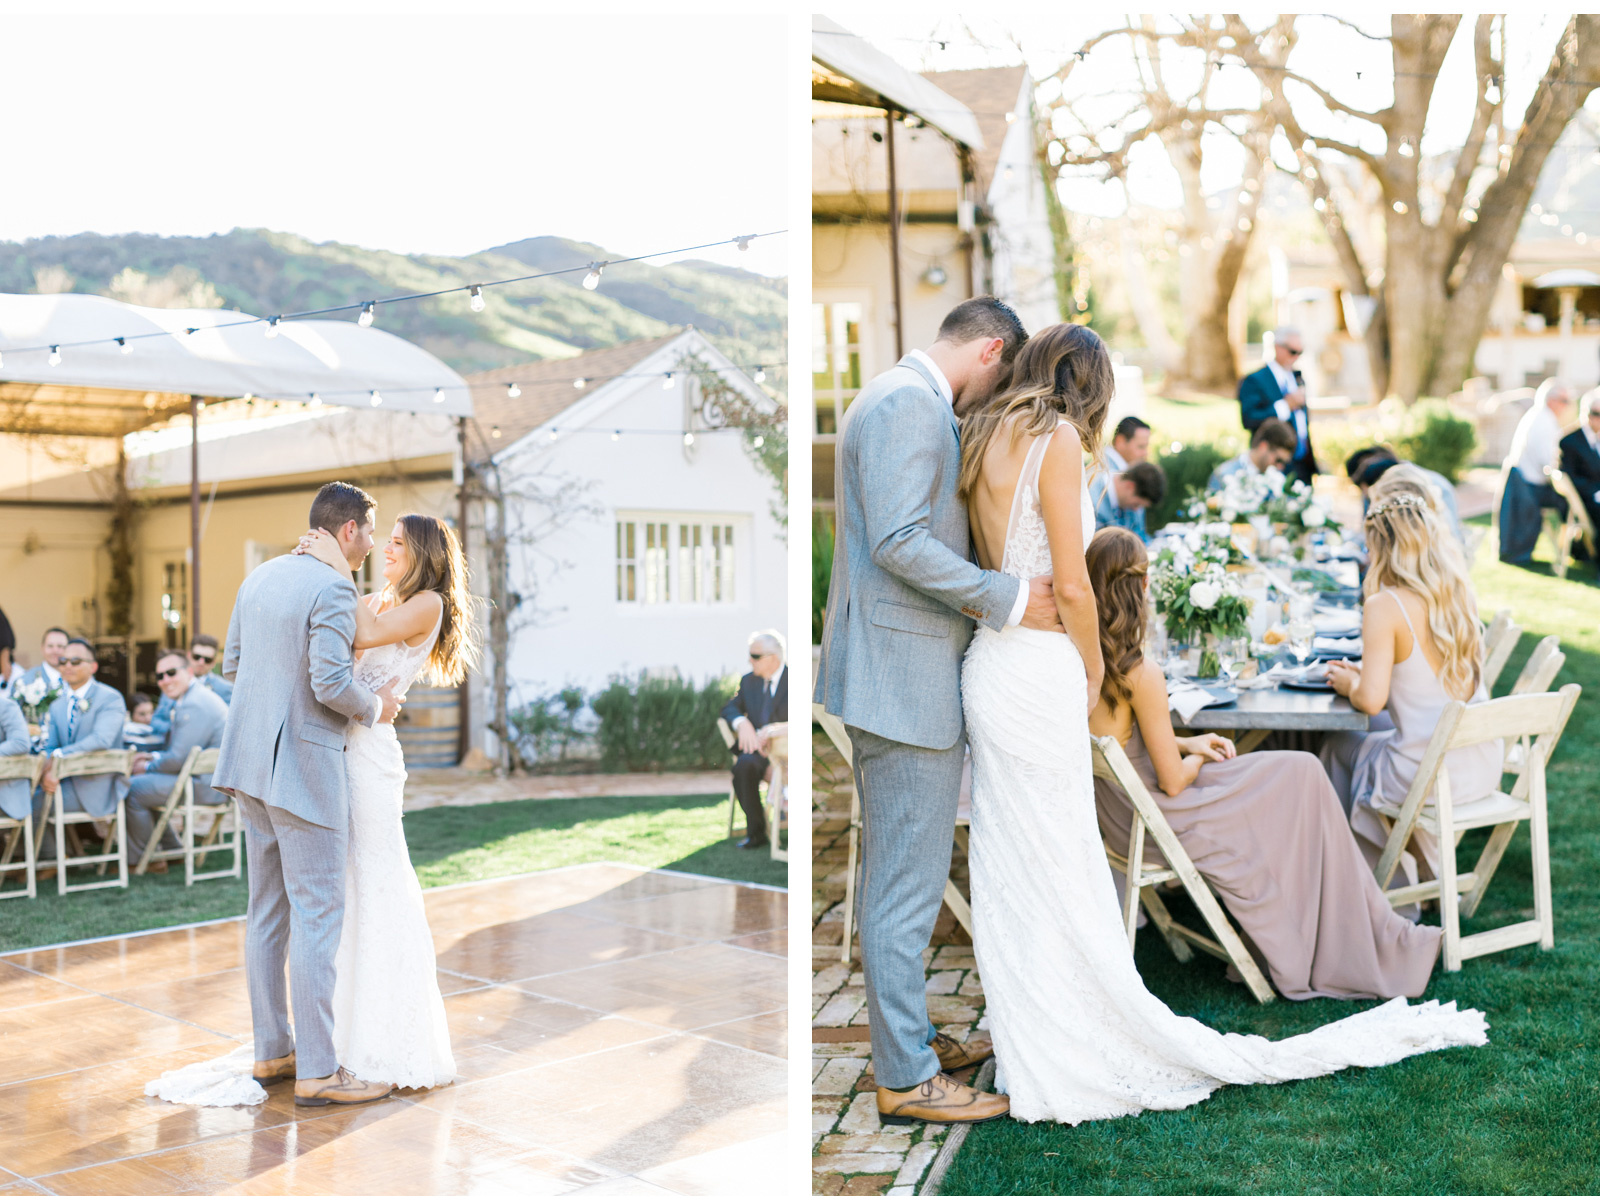 Triunfo-Creek-Saddlerock-Ranch-Wedding-Photographer-Natalie-Schutt-Photography_19.jpg